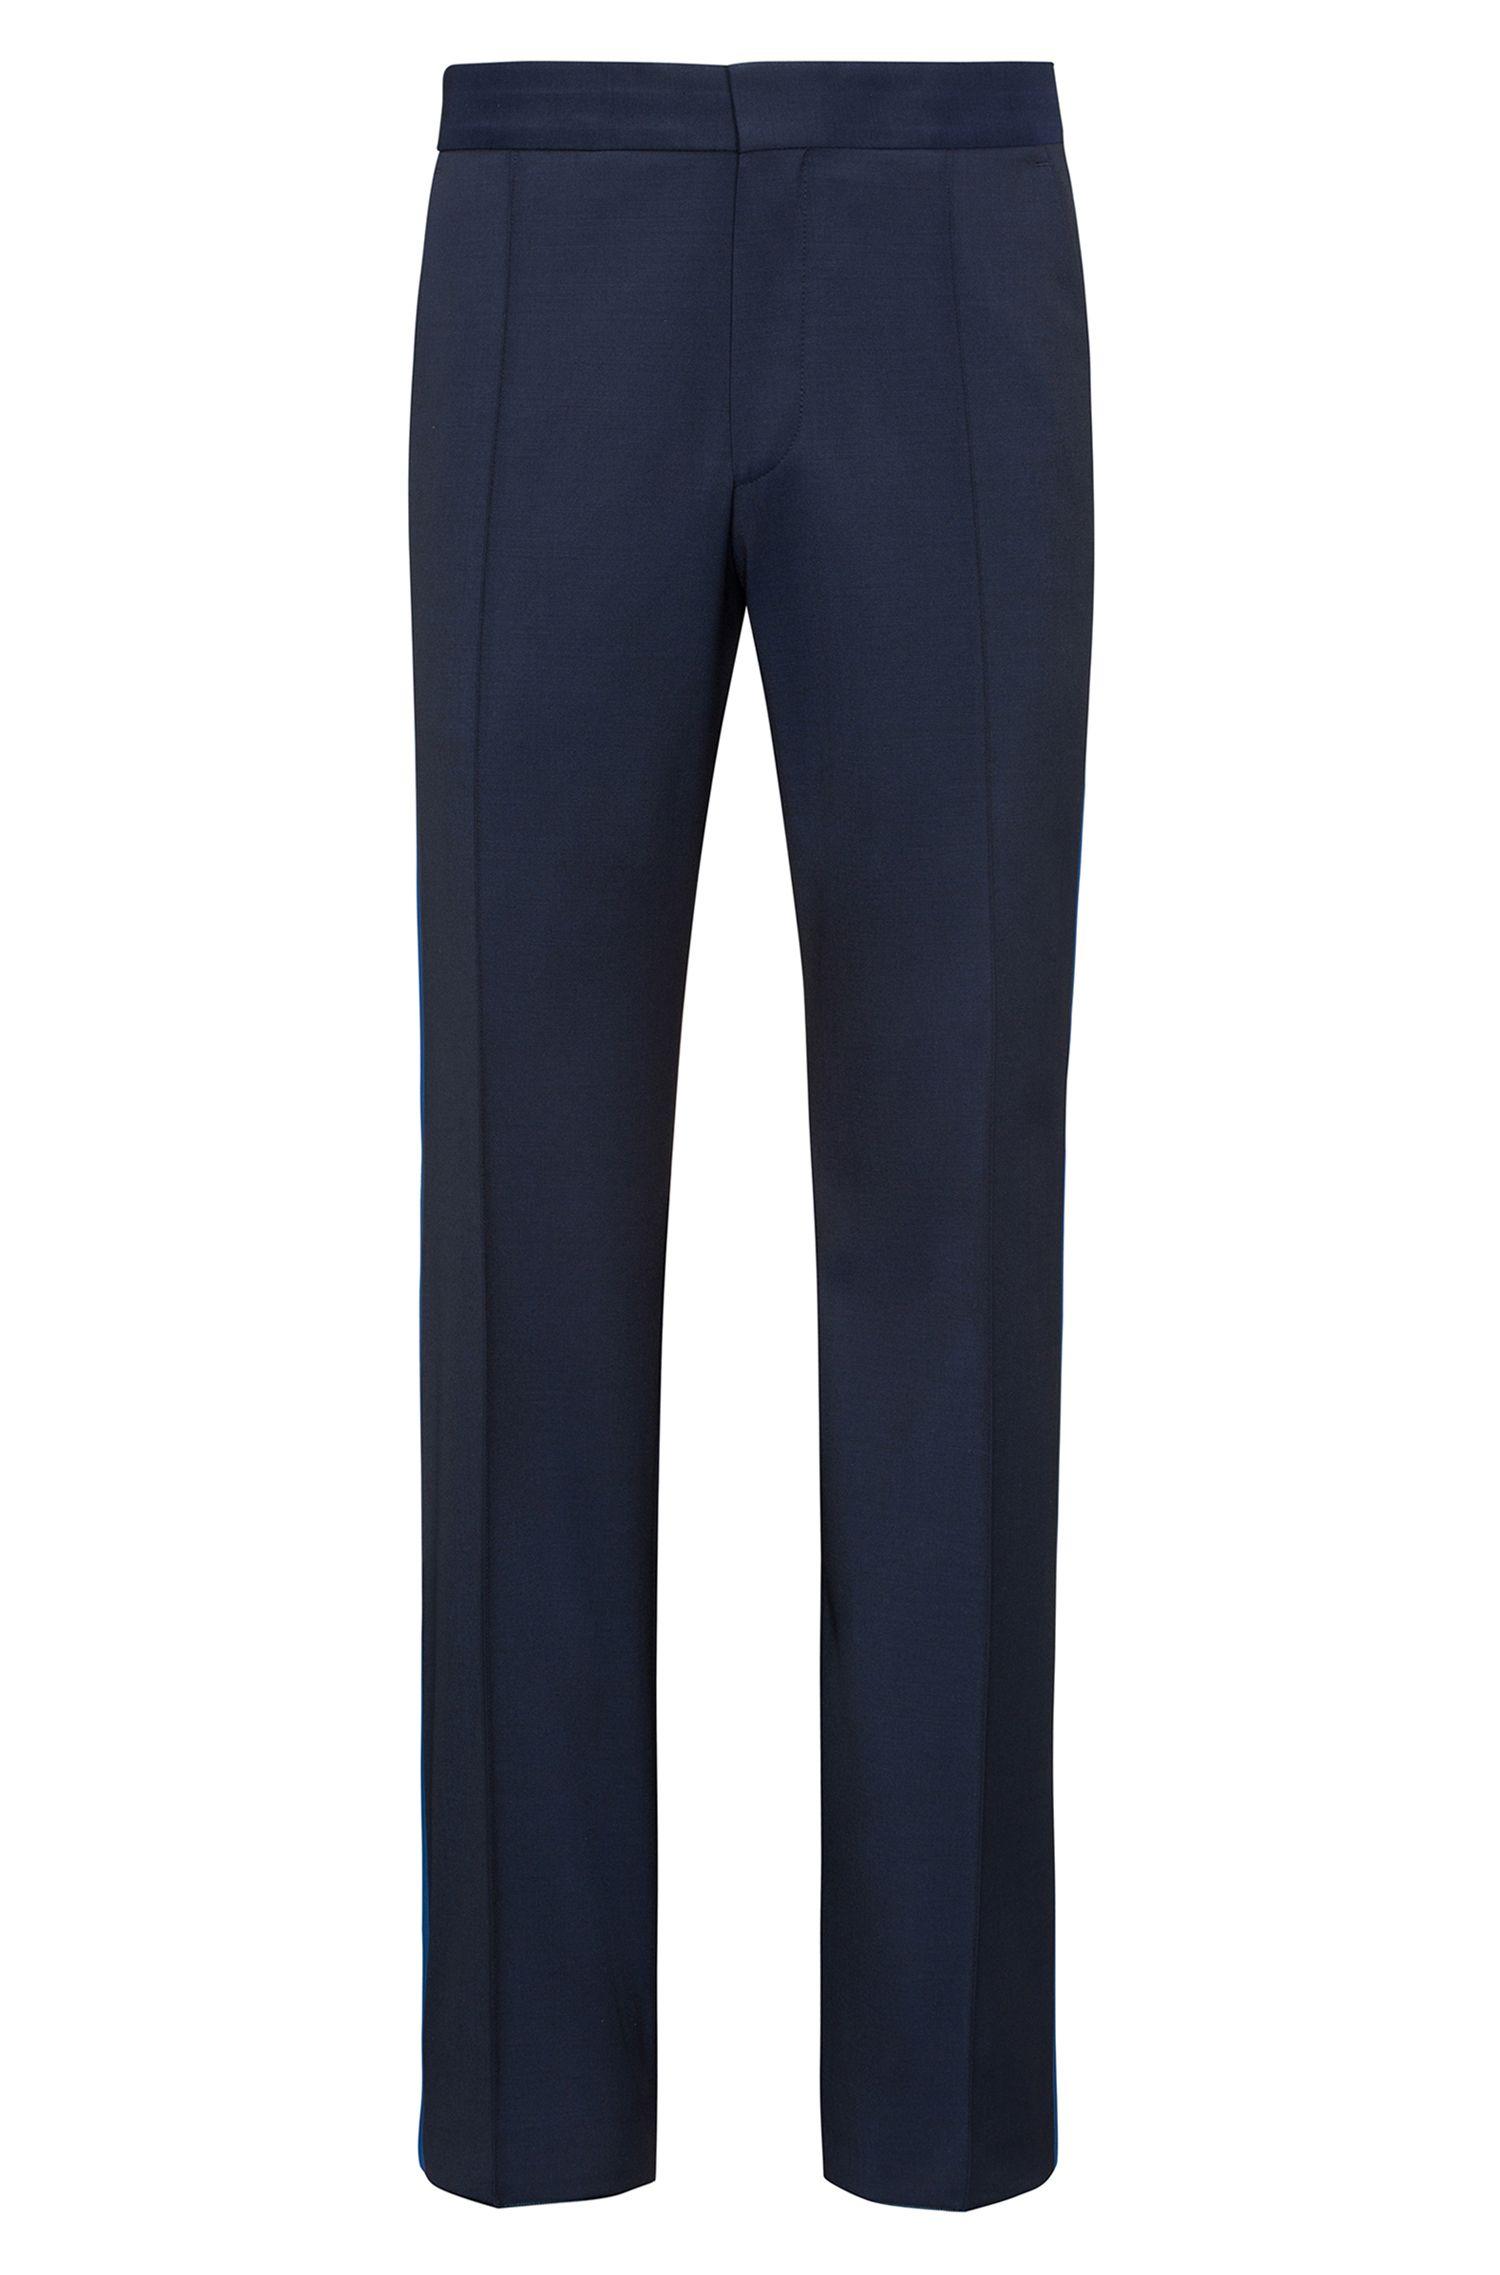 Virgin Wool Dress Pant, Oversized Fit | Fedo